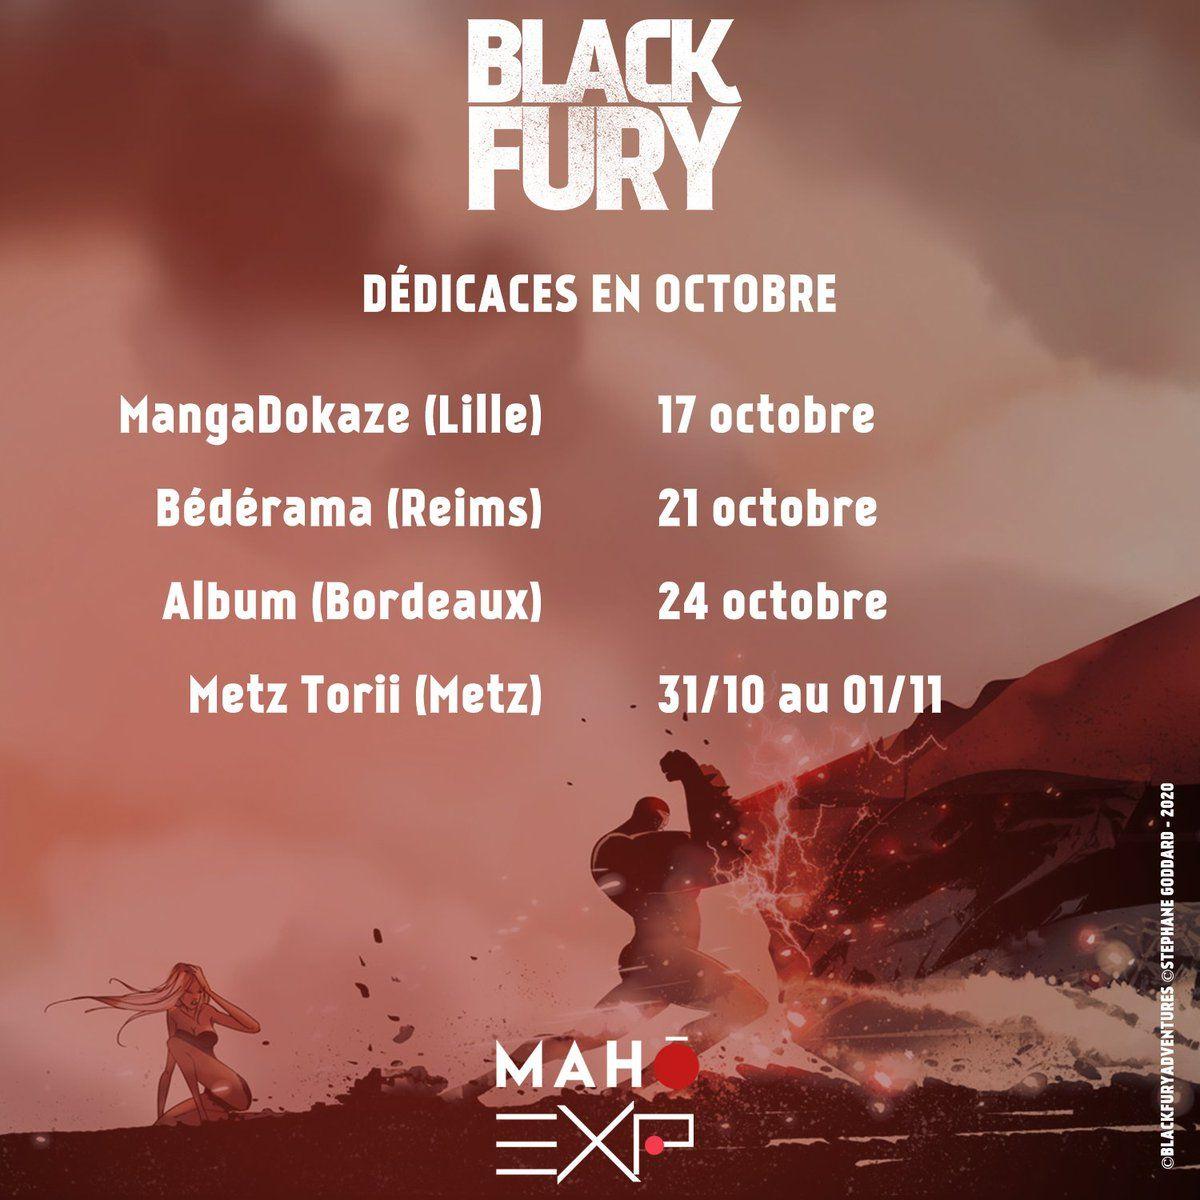 dedicace-octobre-2020-blackfury.jpg